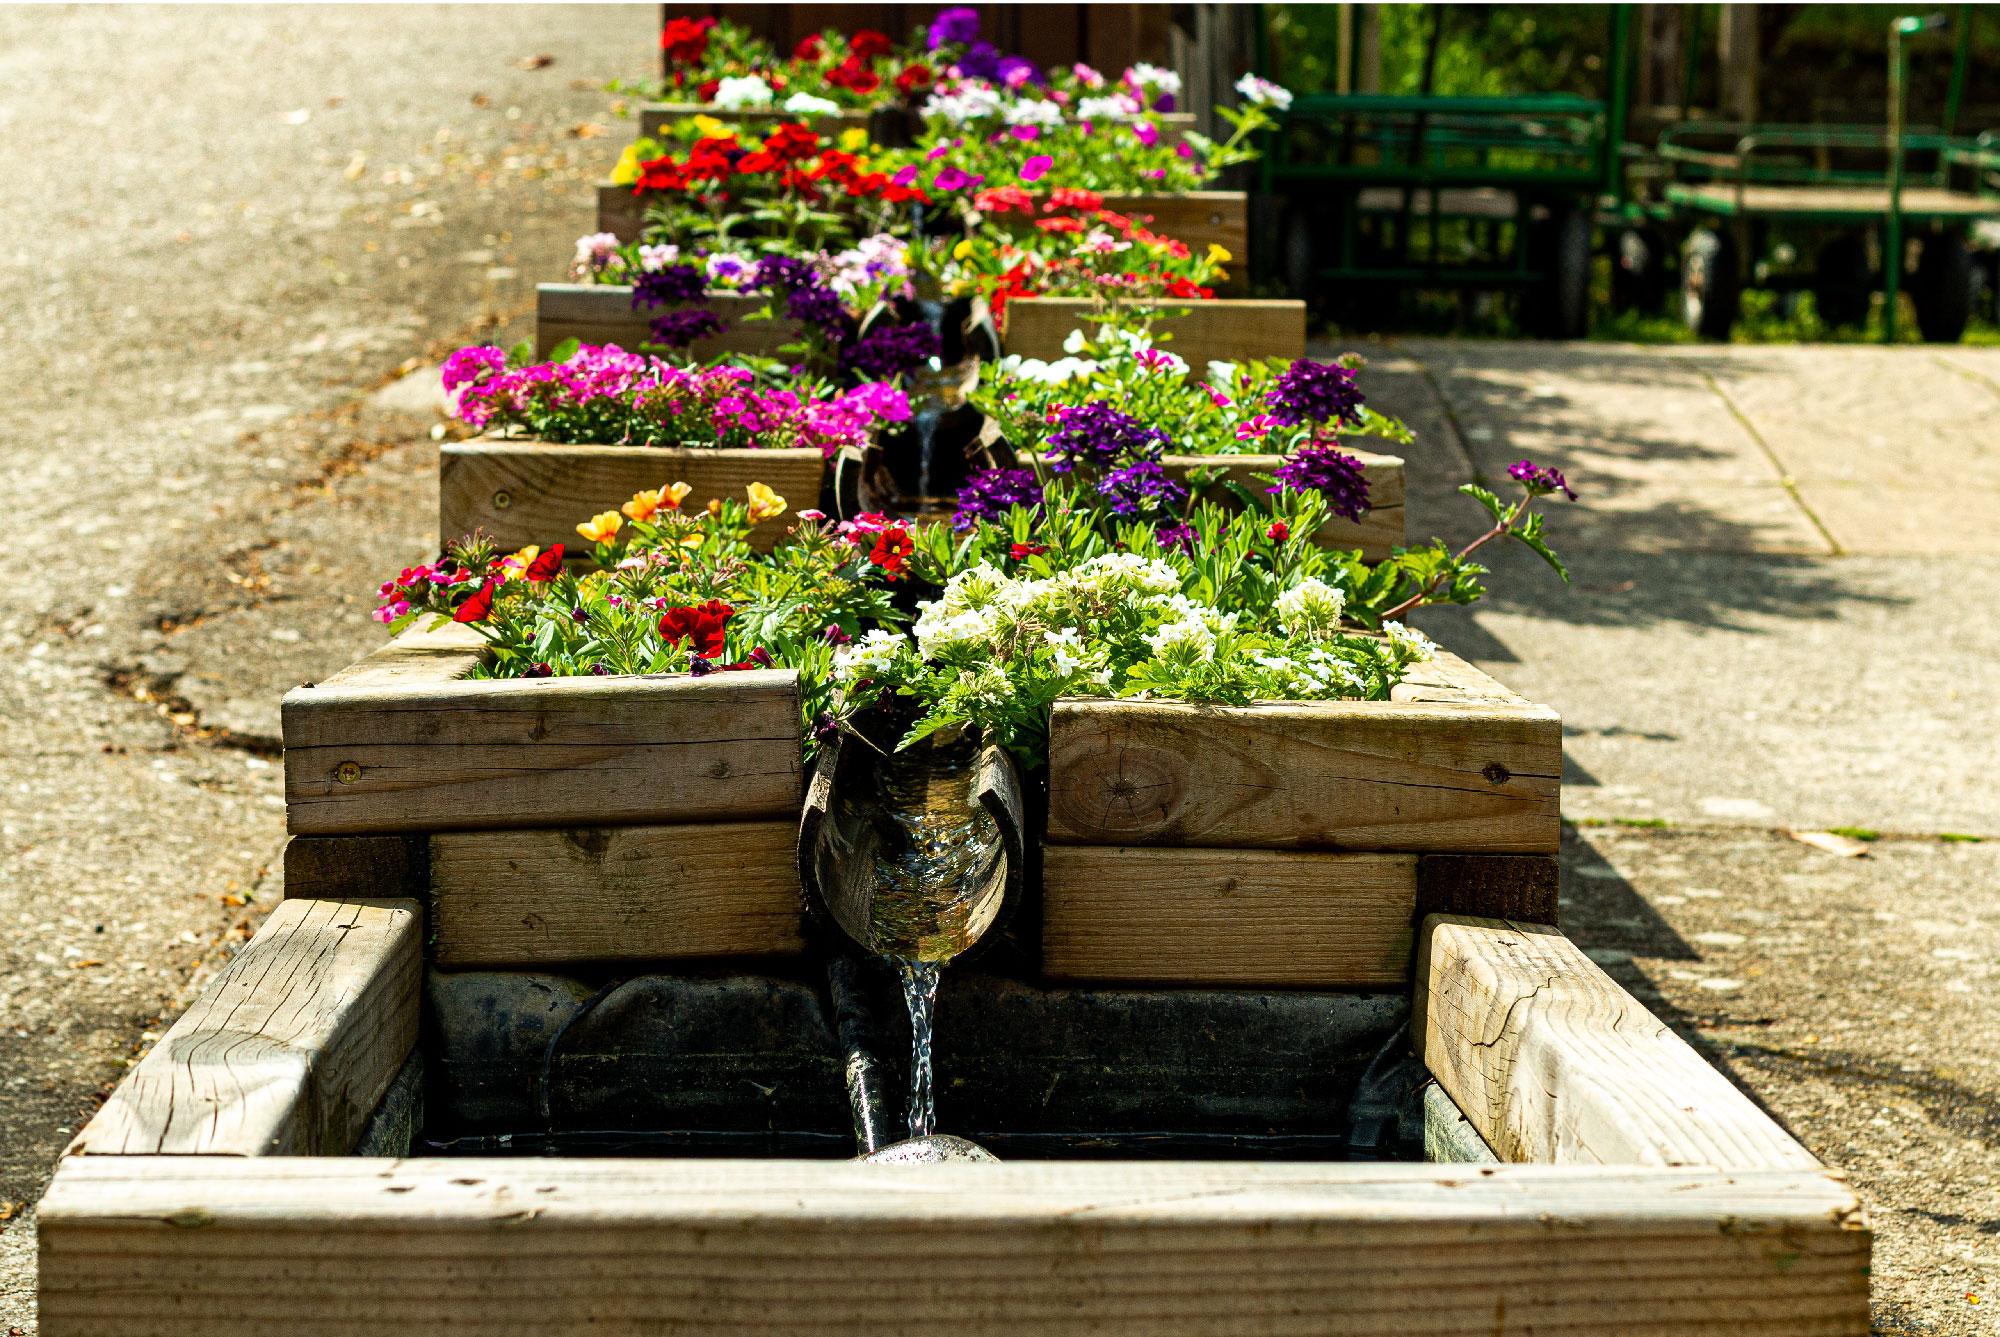 Serre et jardins à Saint Jean du Gard